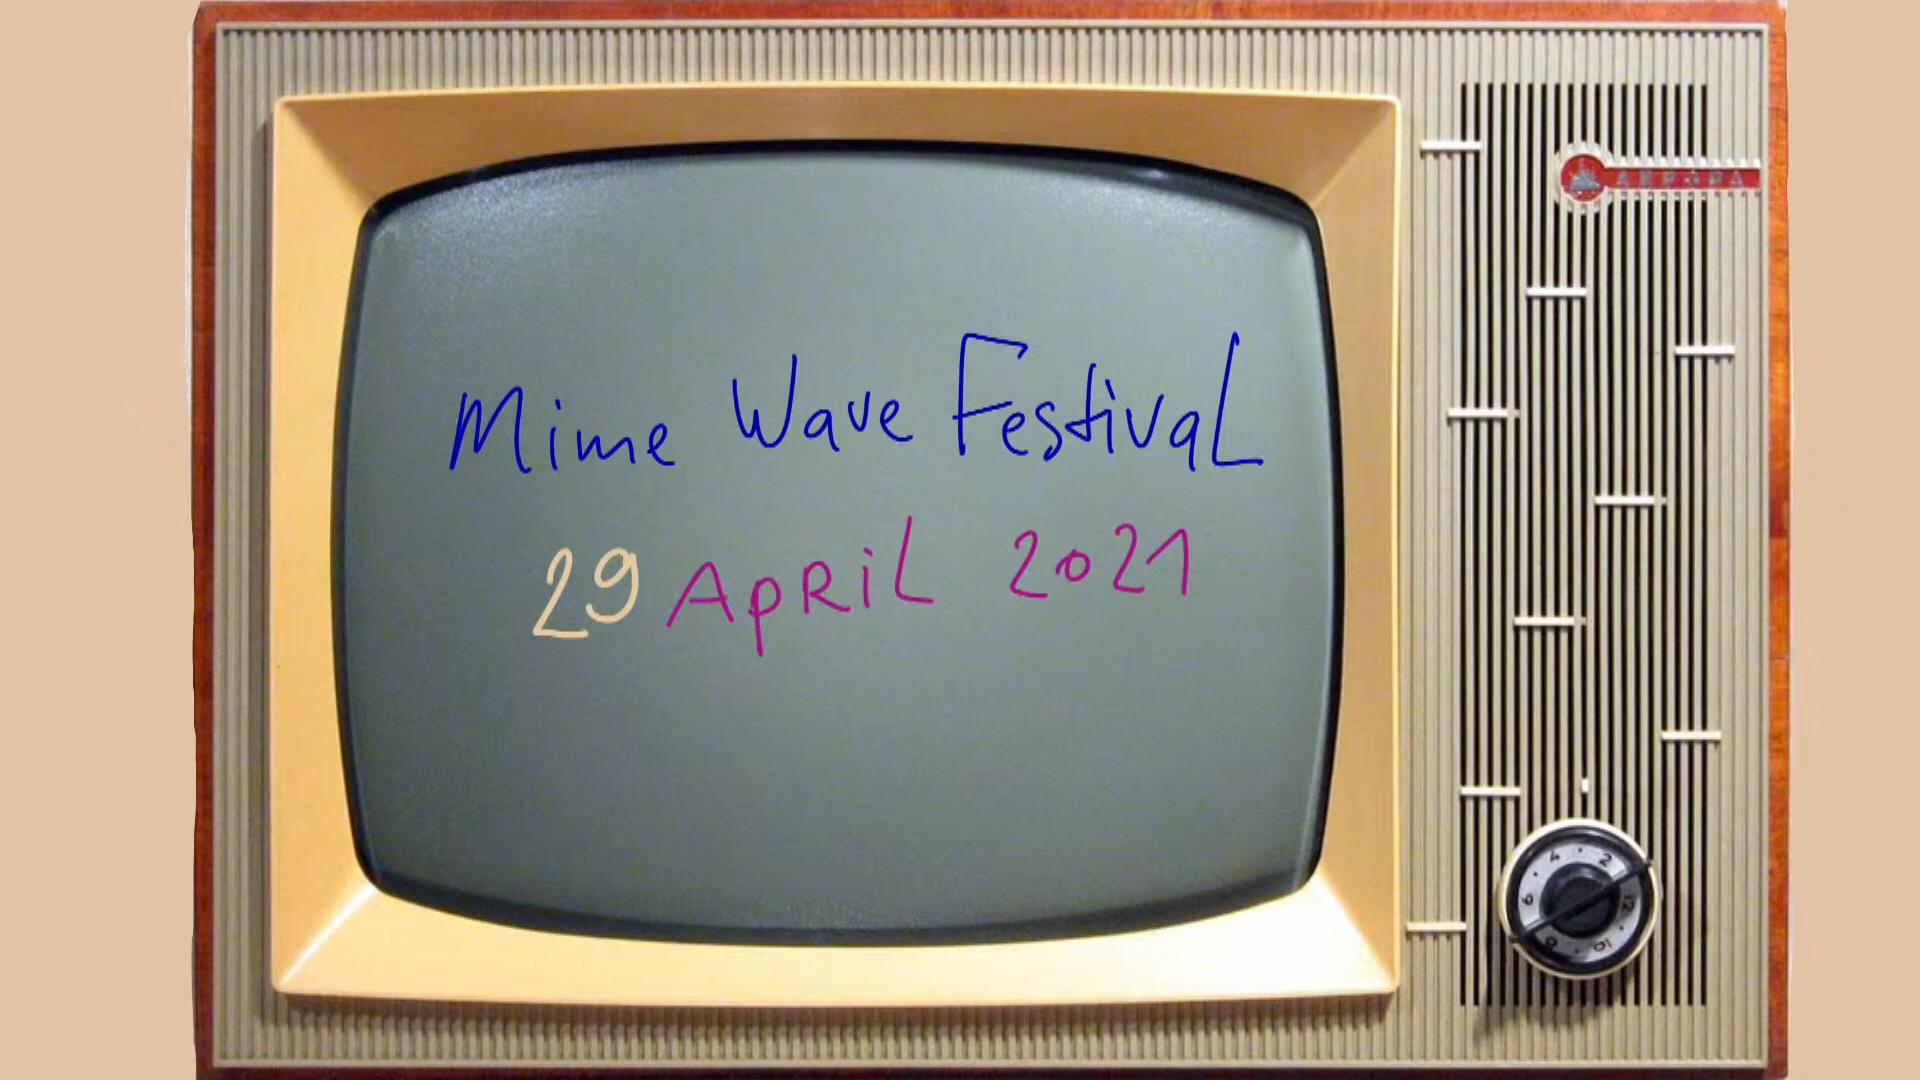 Завершився Міжнародний фестиваль фізичного театру «Mime Wave Festival»